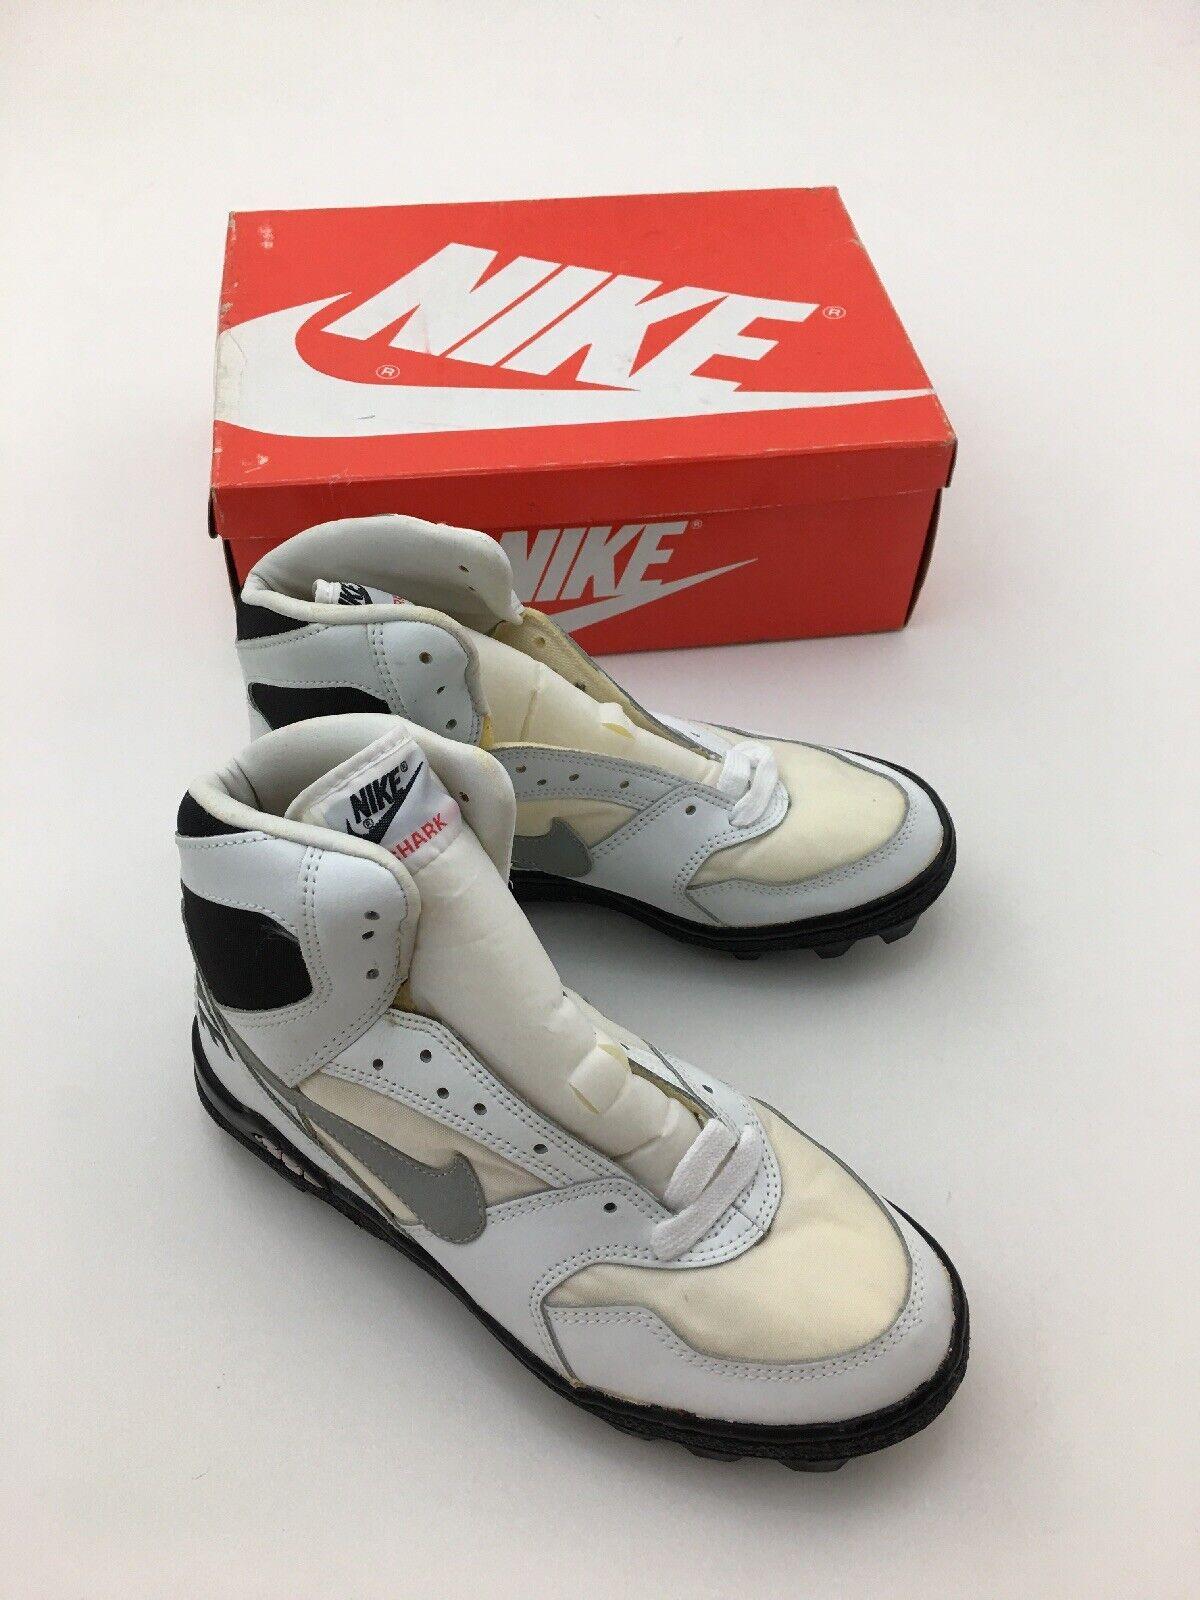 Vintage nike land shark Hi football cleats shoes men's size 7.5 NIB NOS